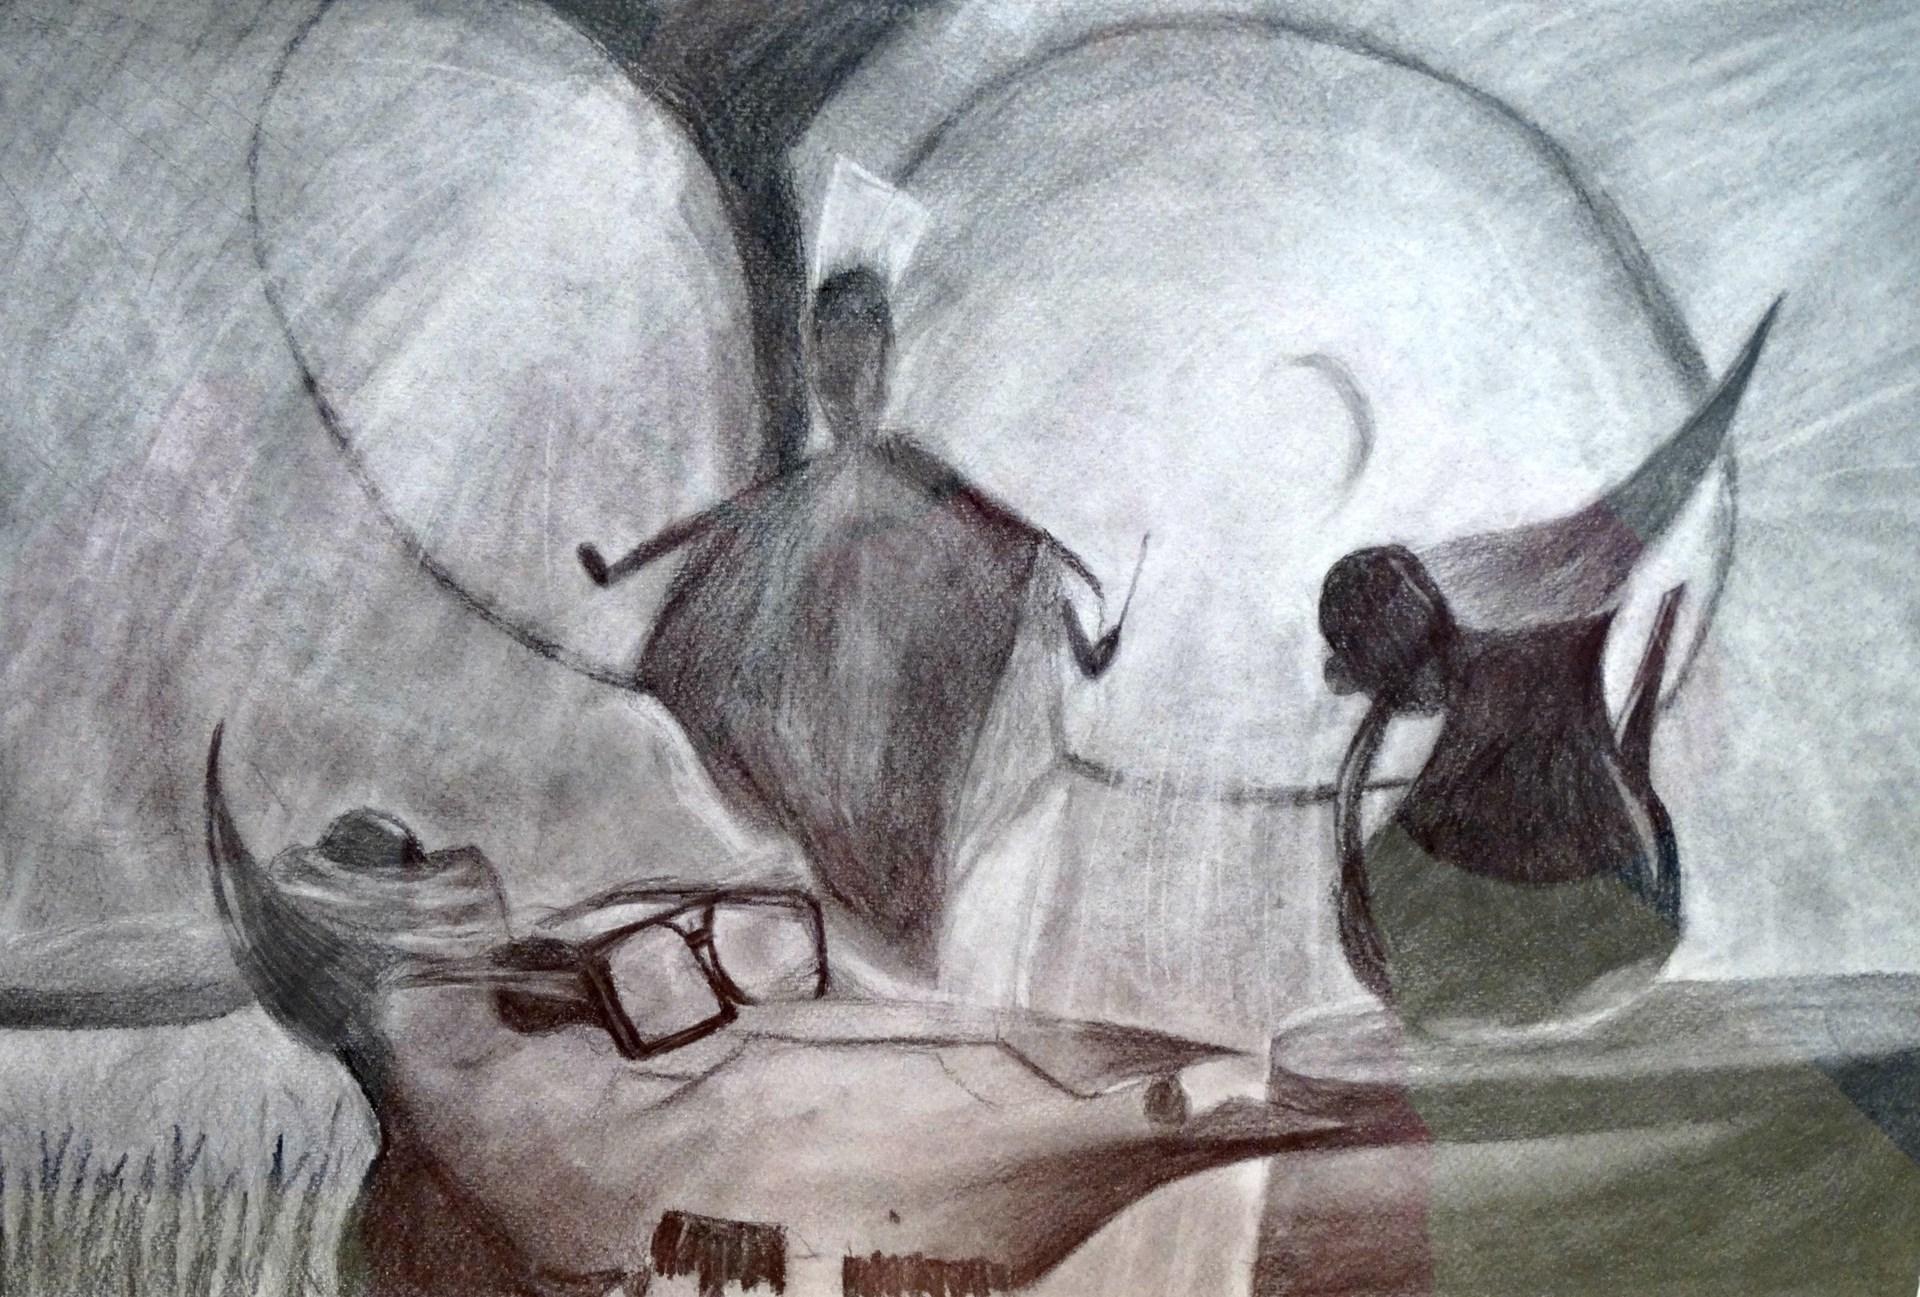 Artist: Paige Smith, Grade 12 at McGuffey HS